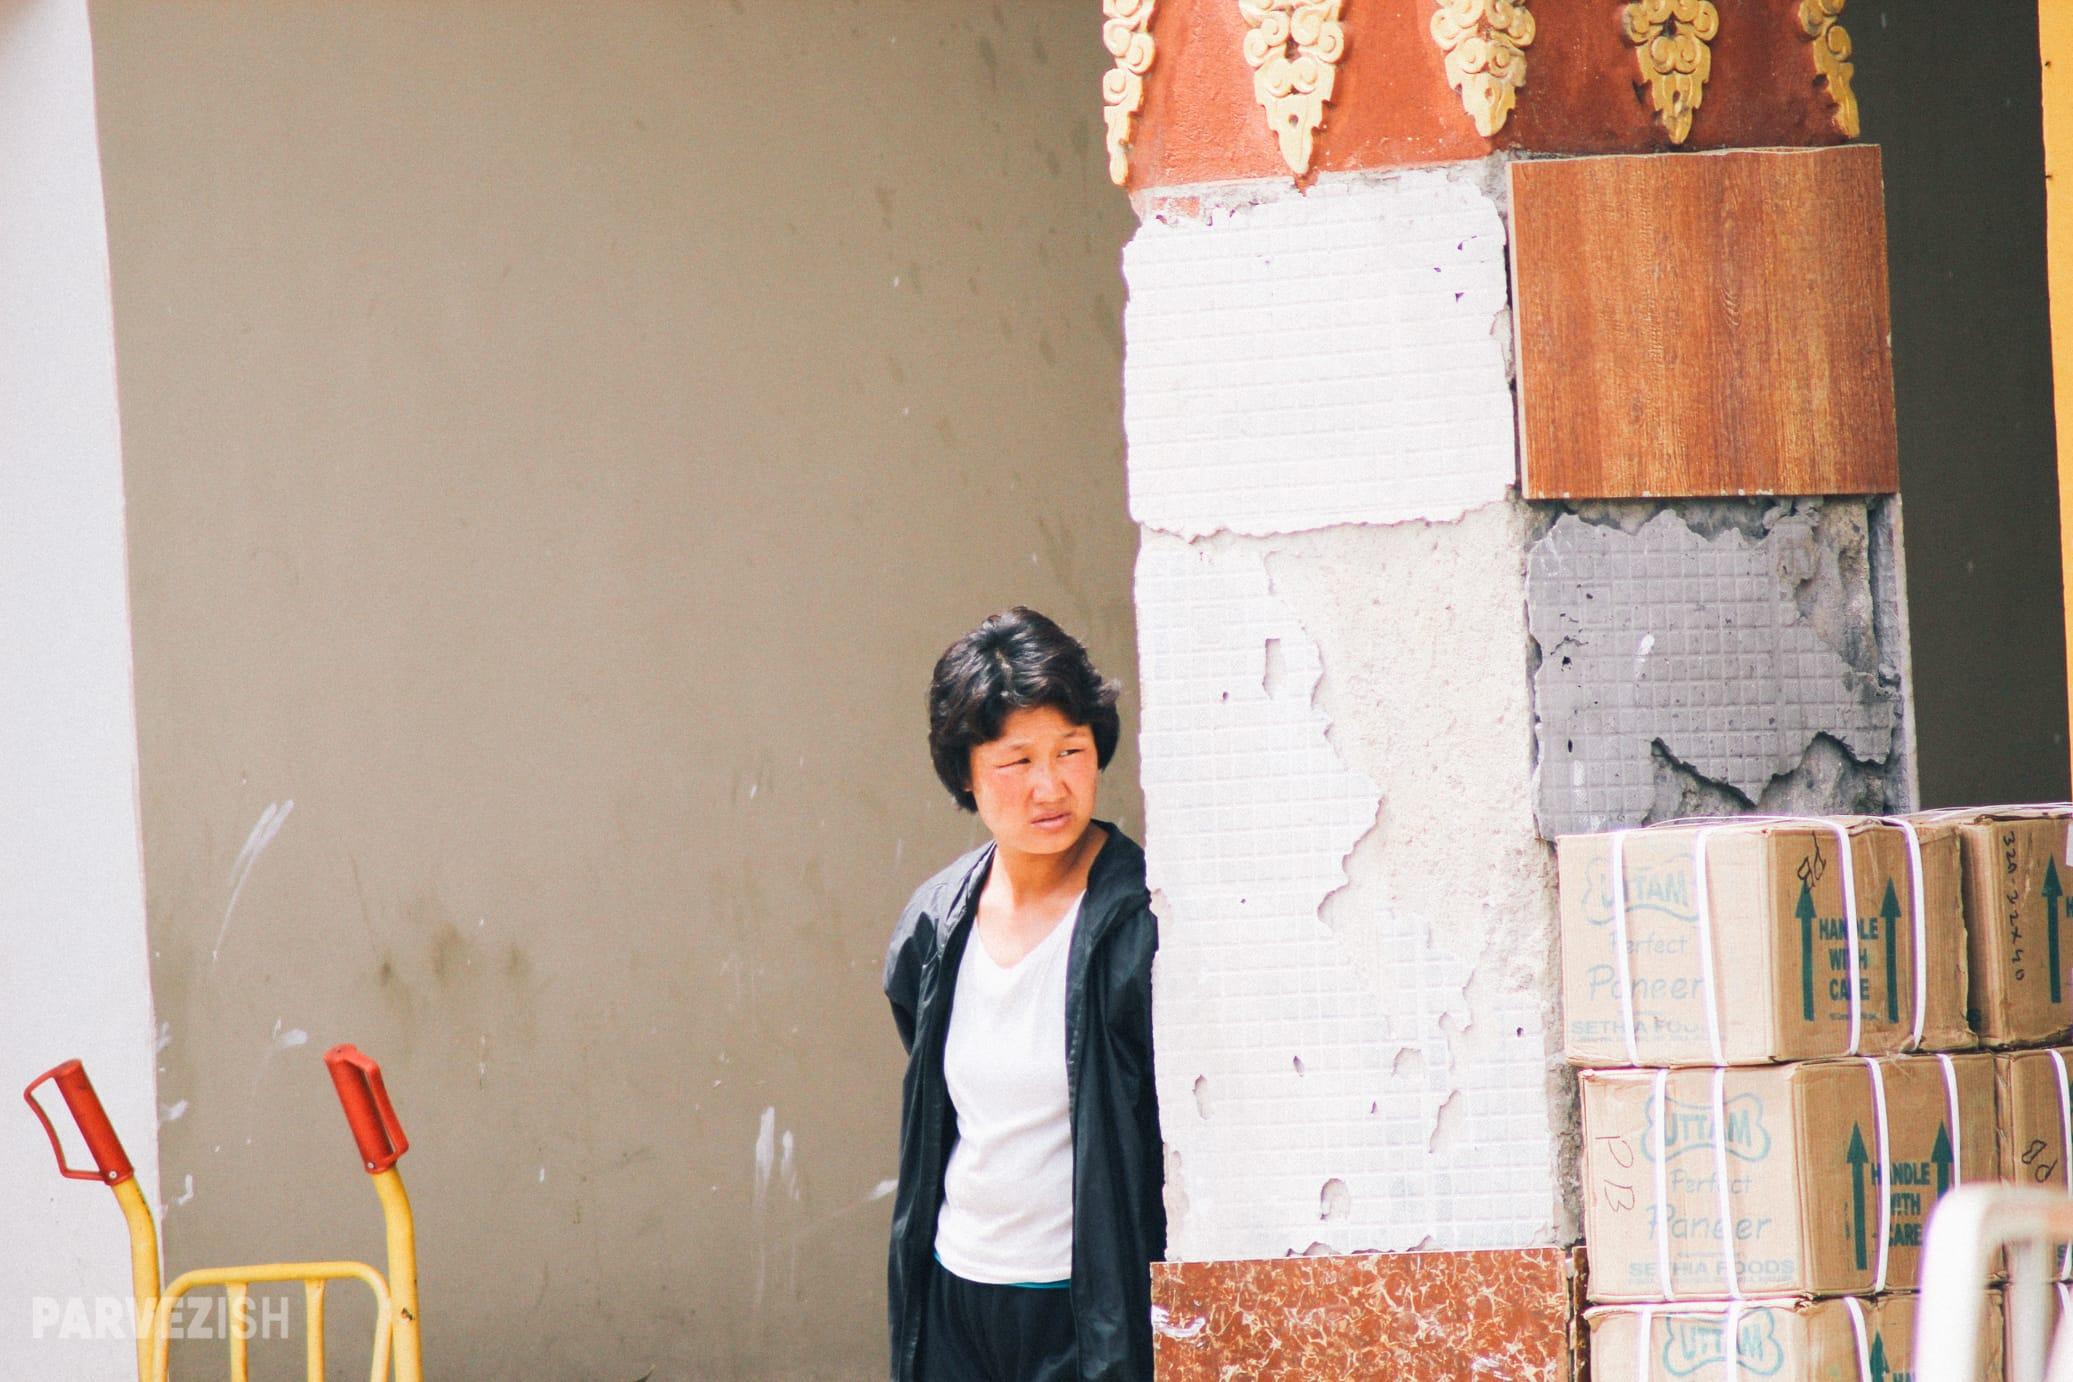 A Woman in Streets of Paro Bhutan